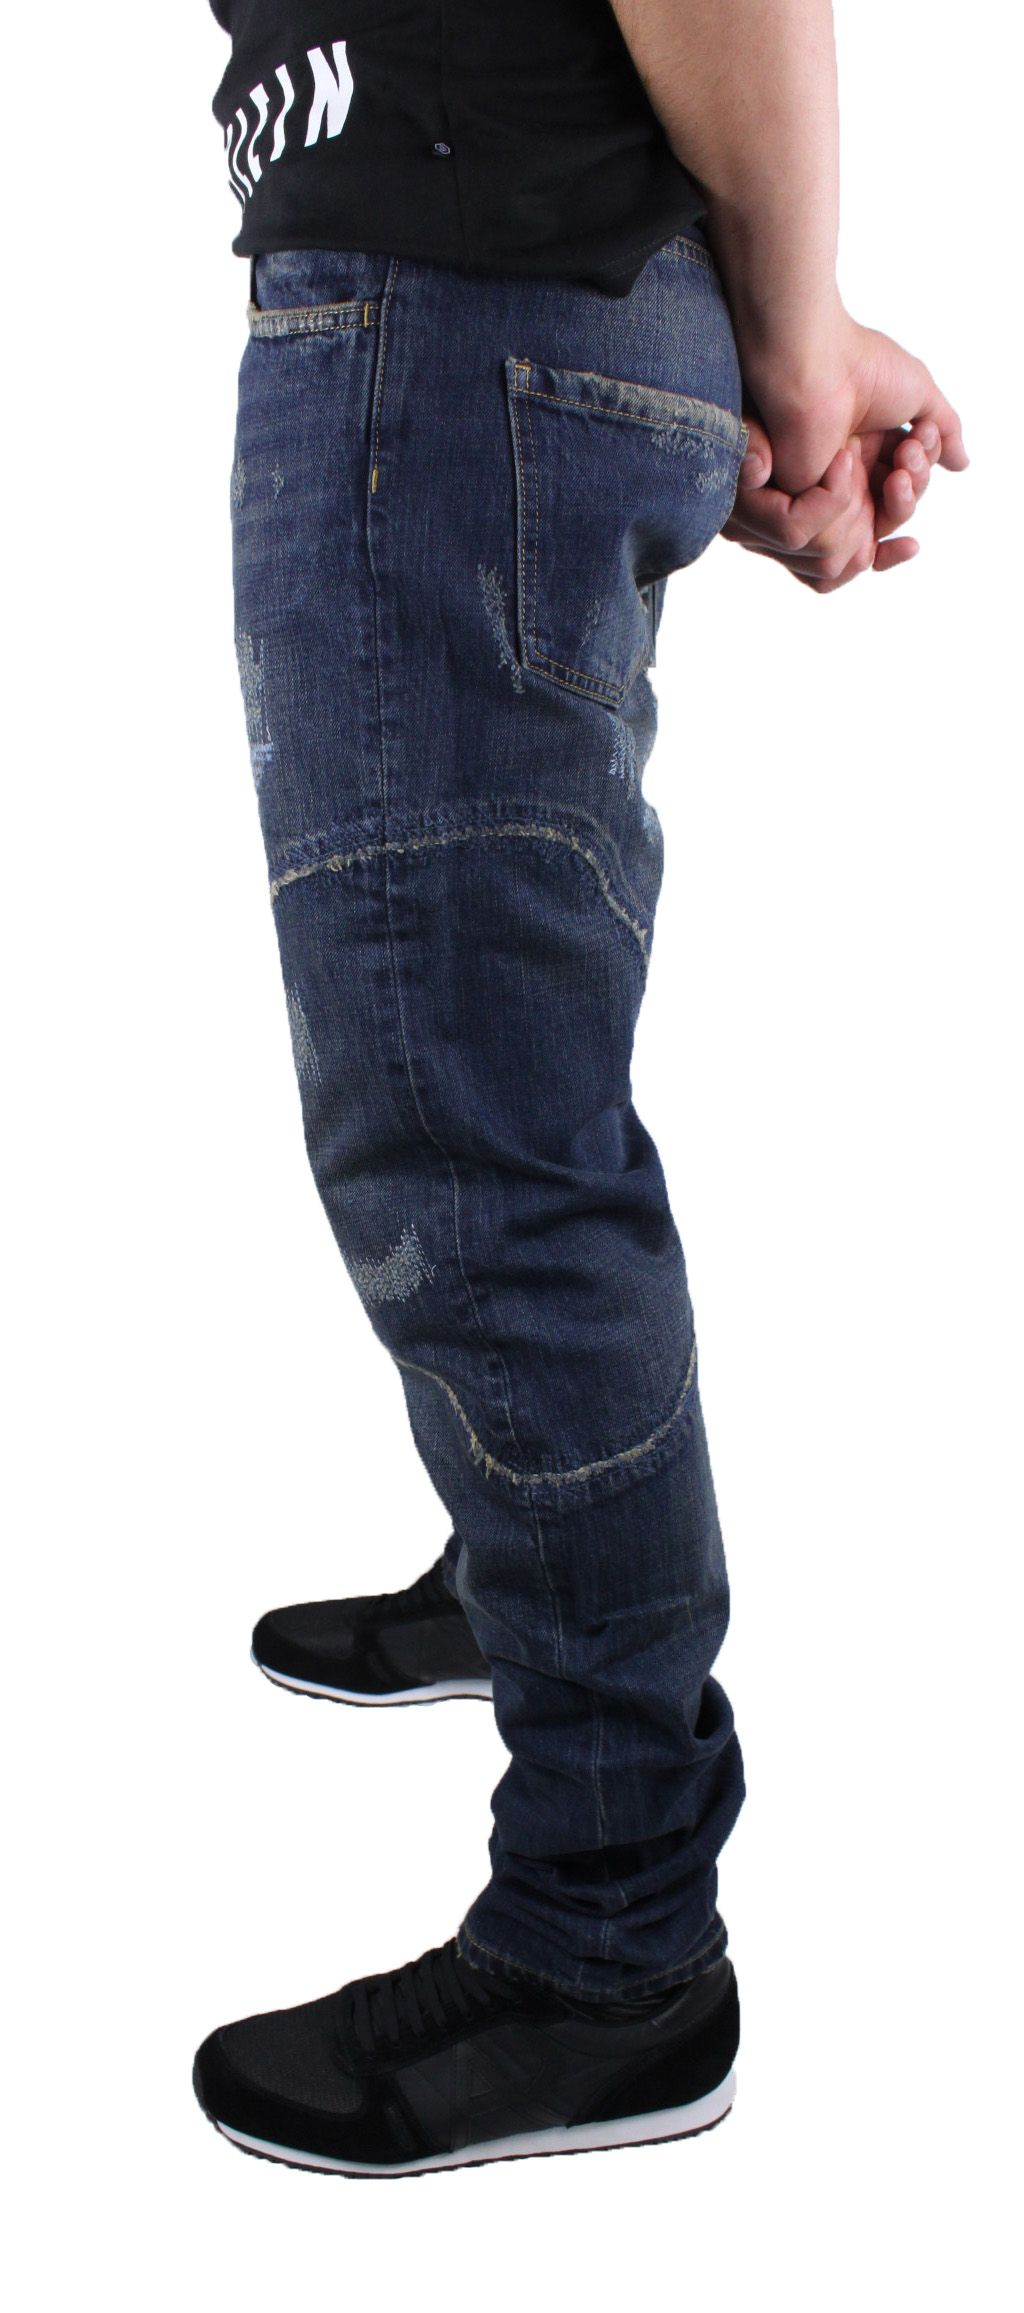 Philipp Plein Vulcano 8MY Military Blue Jeans